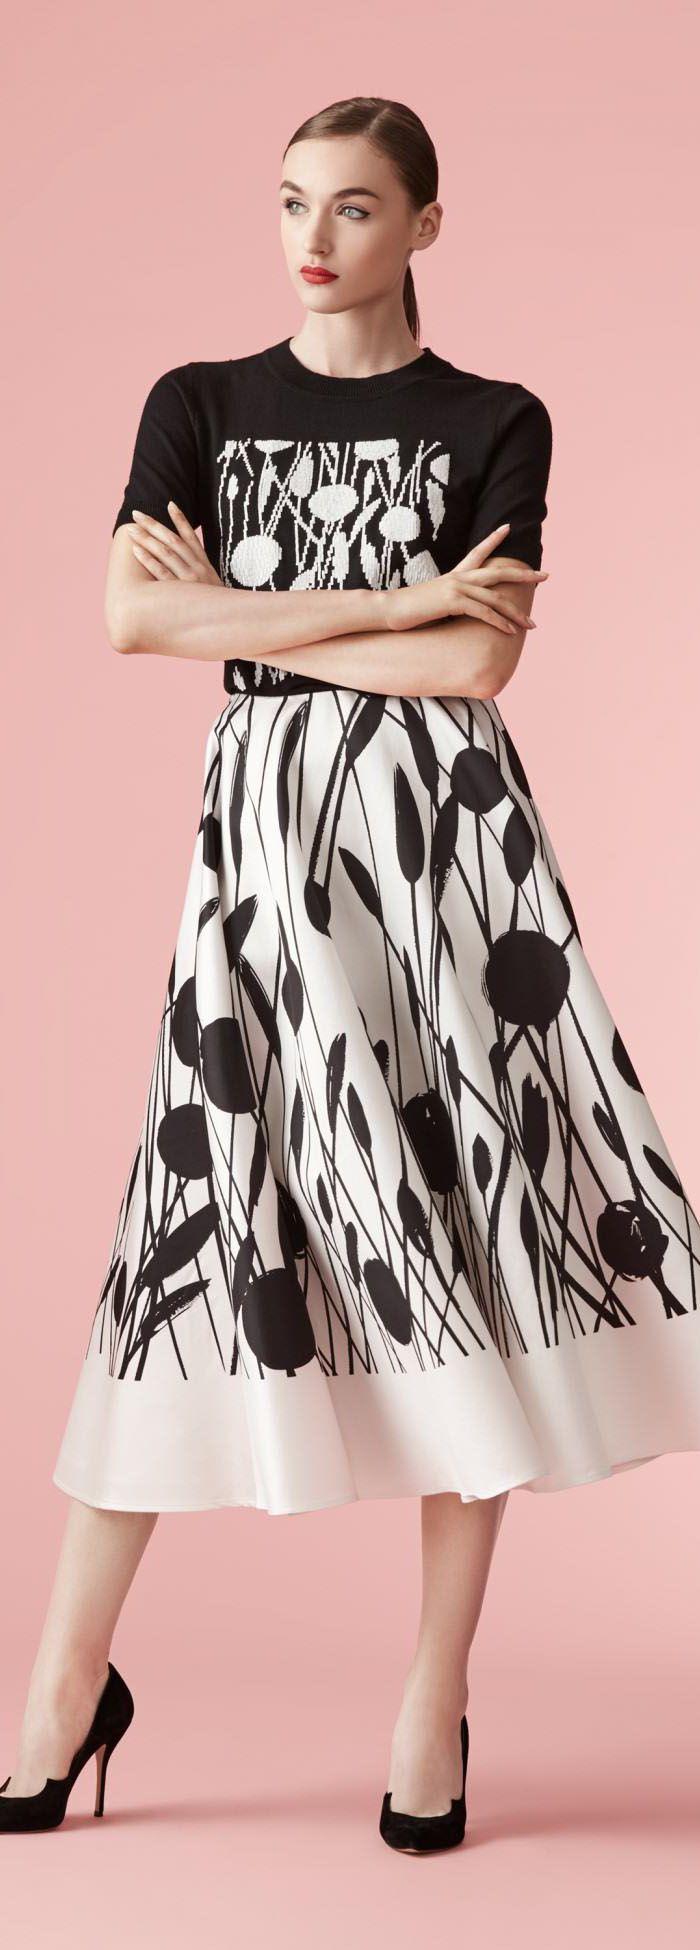 Carolina Herrera Resort 2017 Collection | moda corto blanco ...